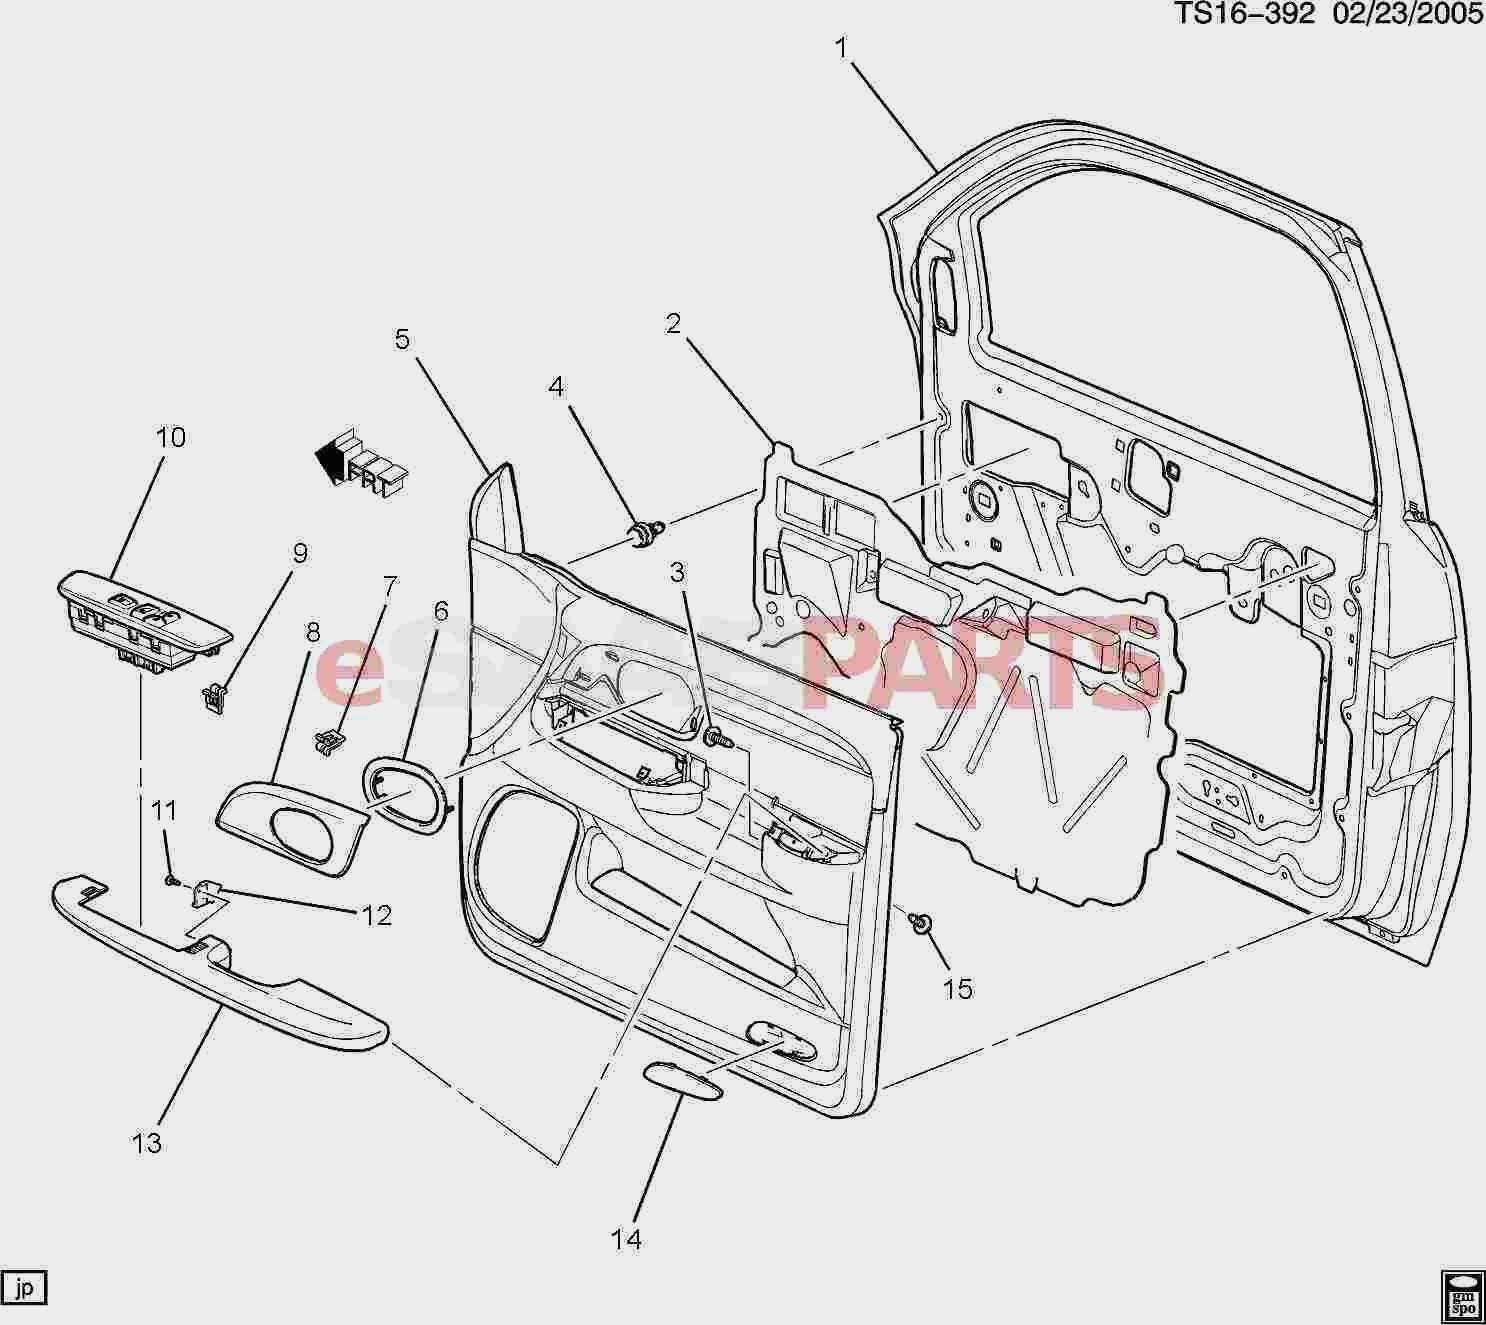 Car Engine Diagram Parts Saab Usa Parts Of Car Engine Diagram Parts